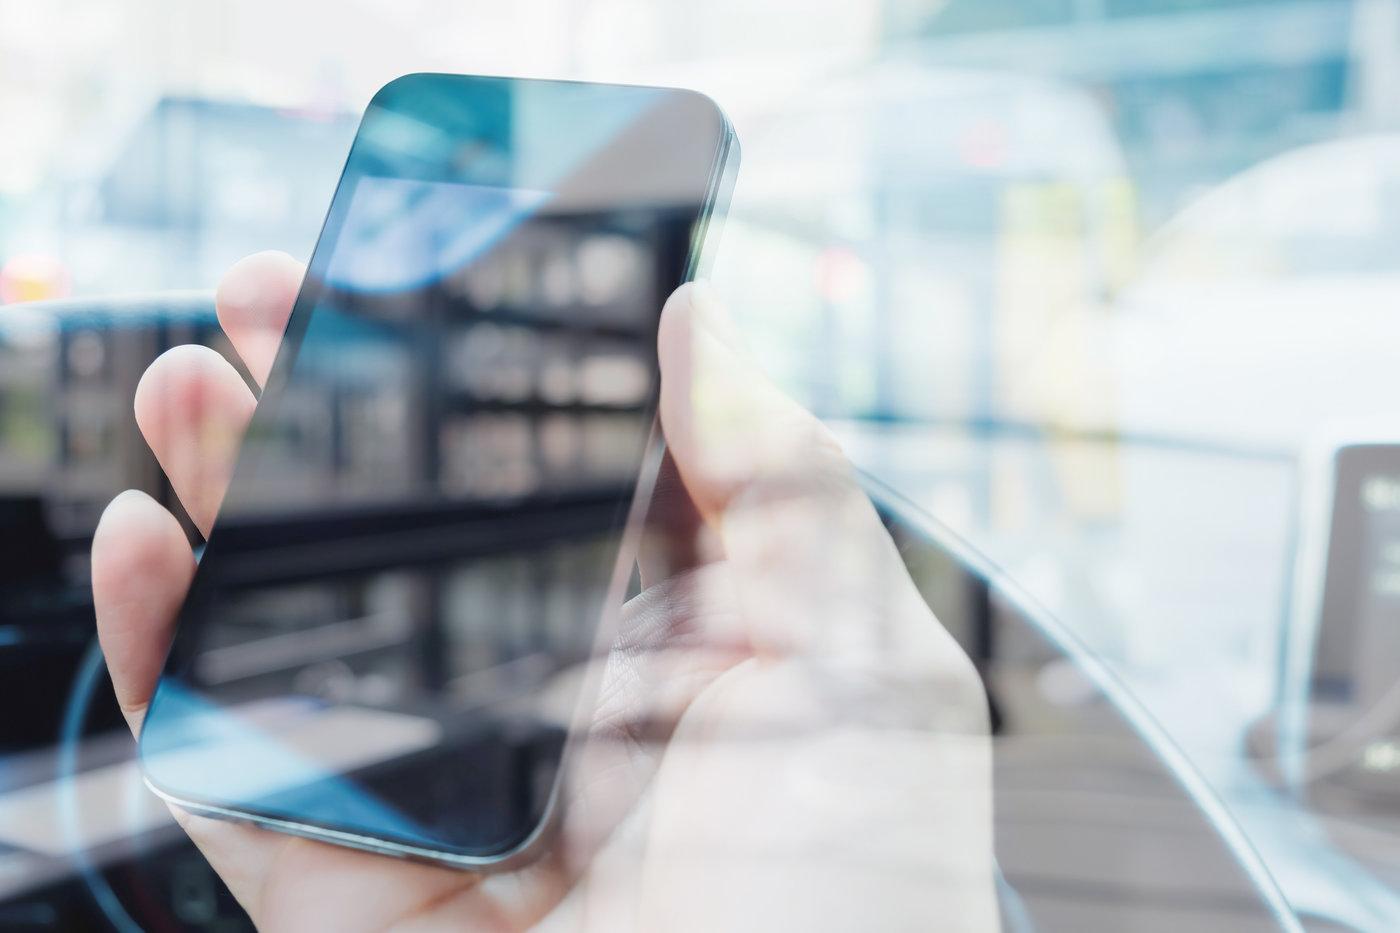 CDN业务毛利率下滑 网宿科技靠卖资产扮靓业绩